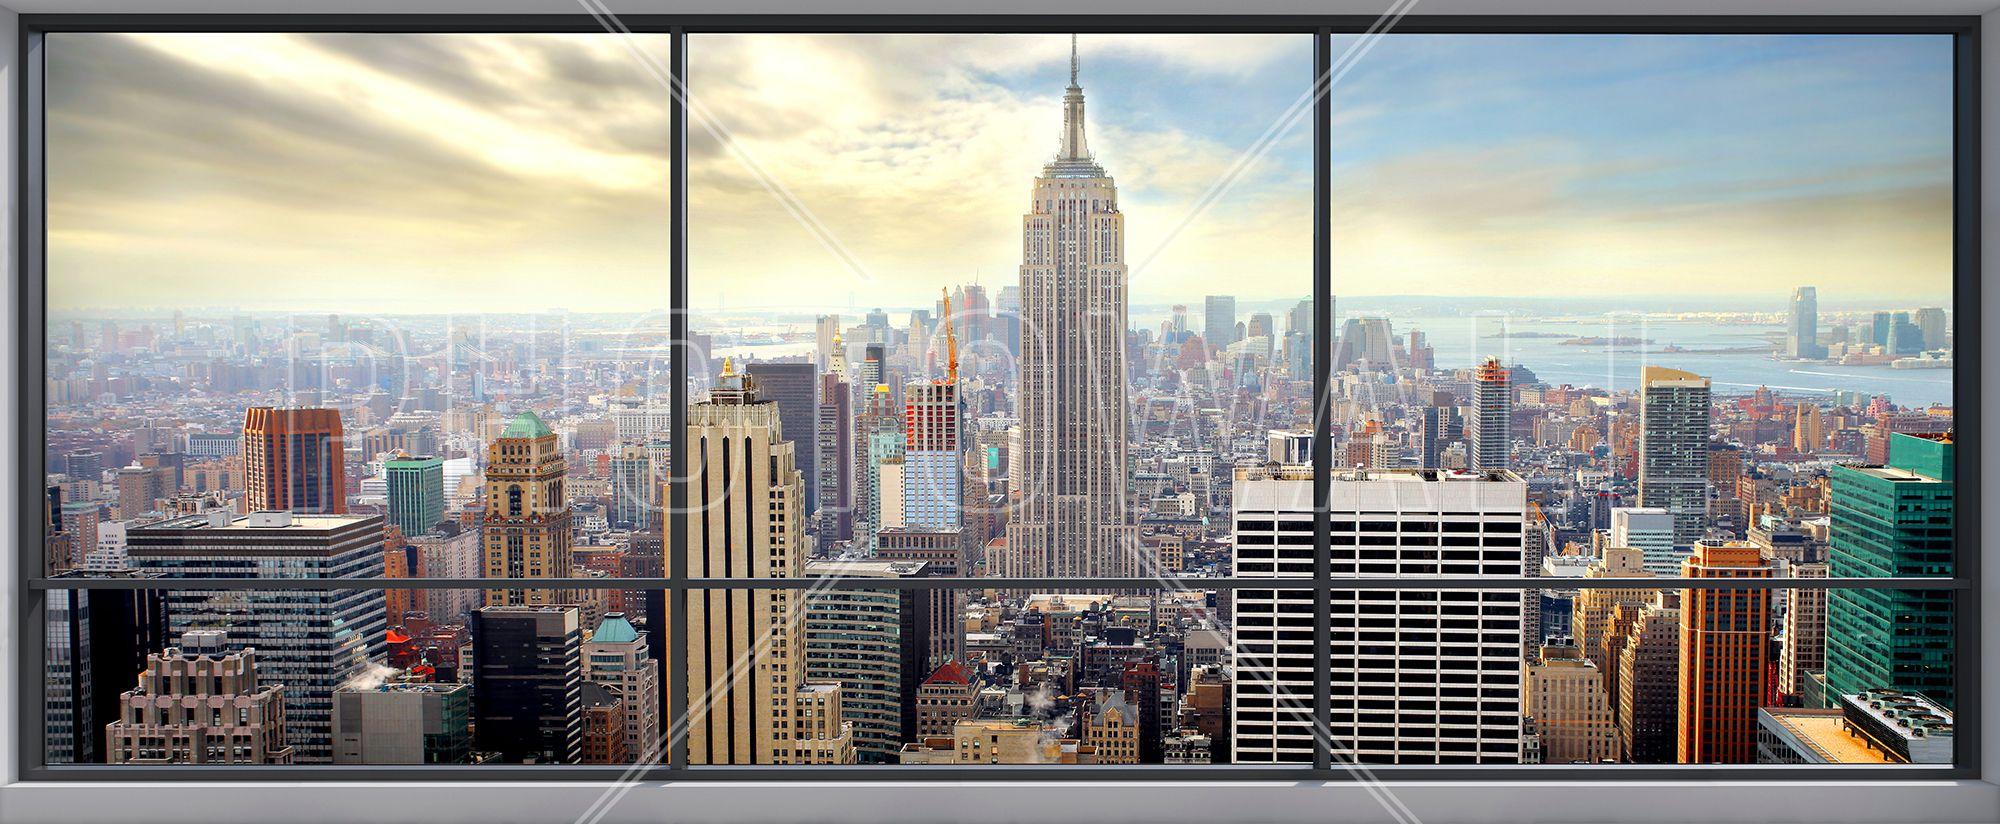 Penthouse Window View Wall Mural & Photo Wallpaper